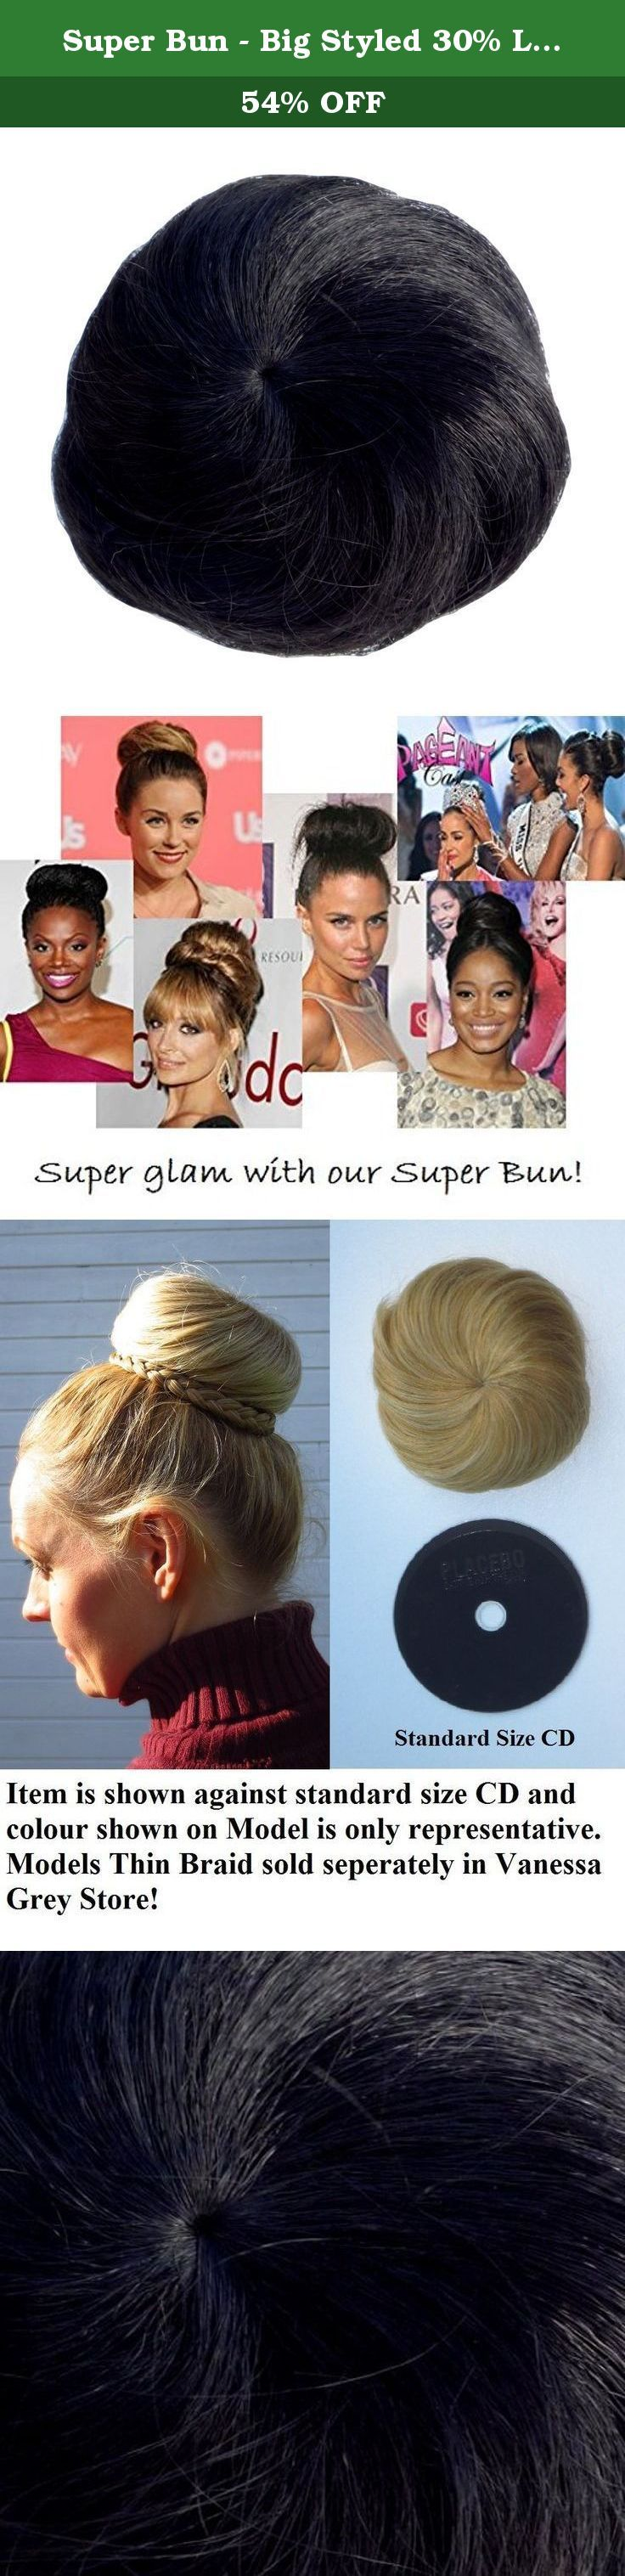 "super bun - big styled 30% larger ""airline stewardess"" bun - 60's"